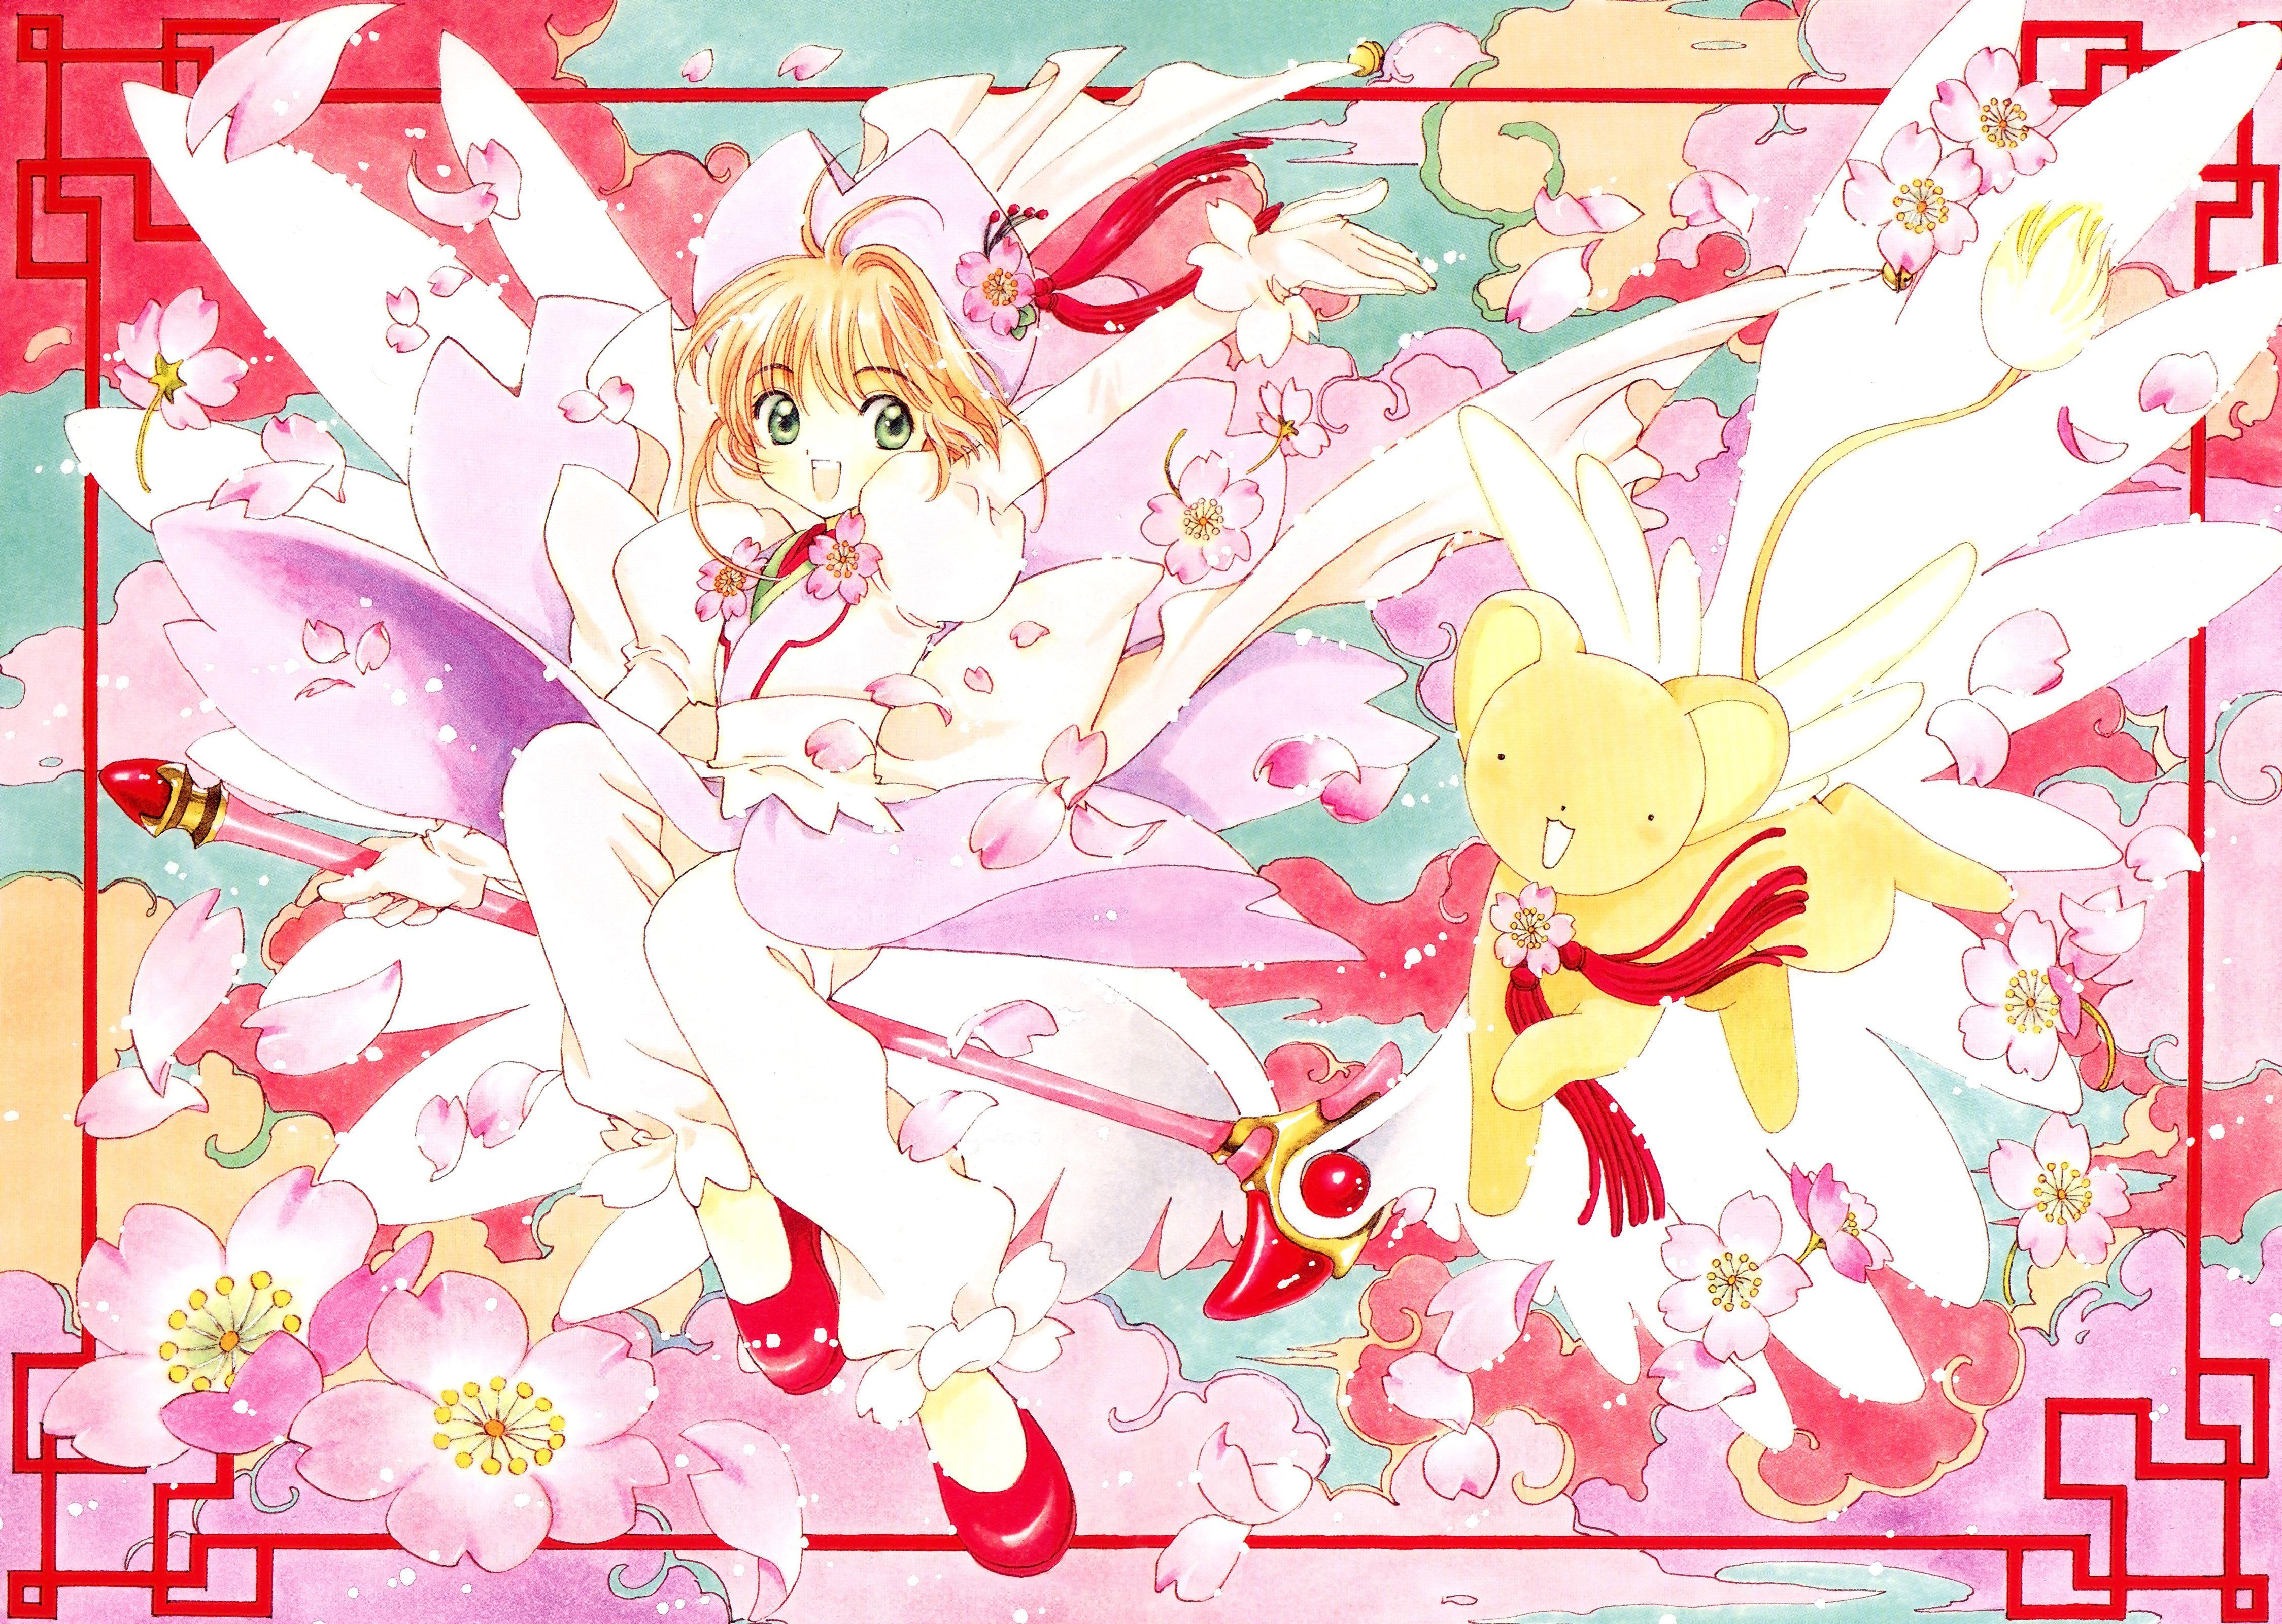 CLAMP, Cardcaptor Sakura, Cardcaptor Sakura Illustrations ...